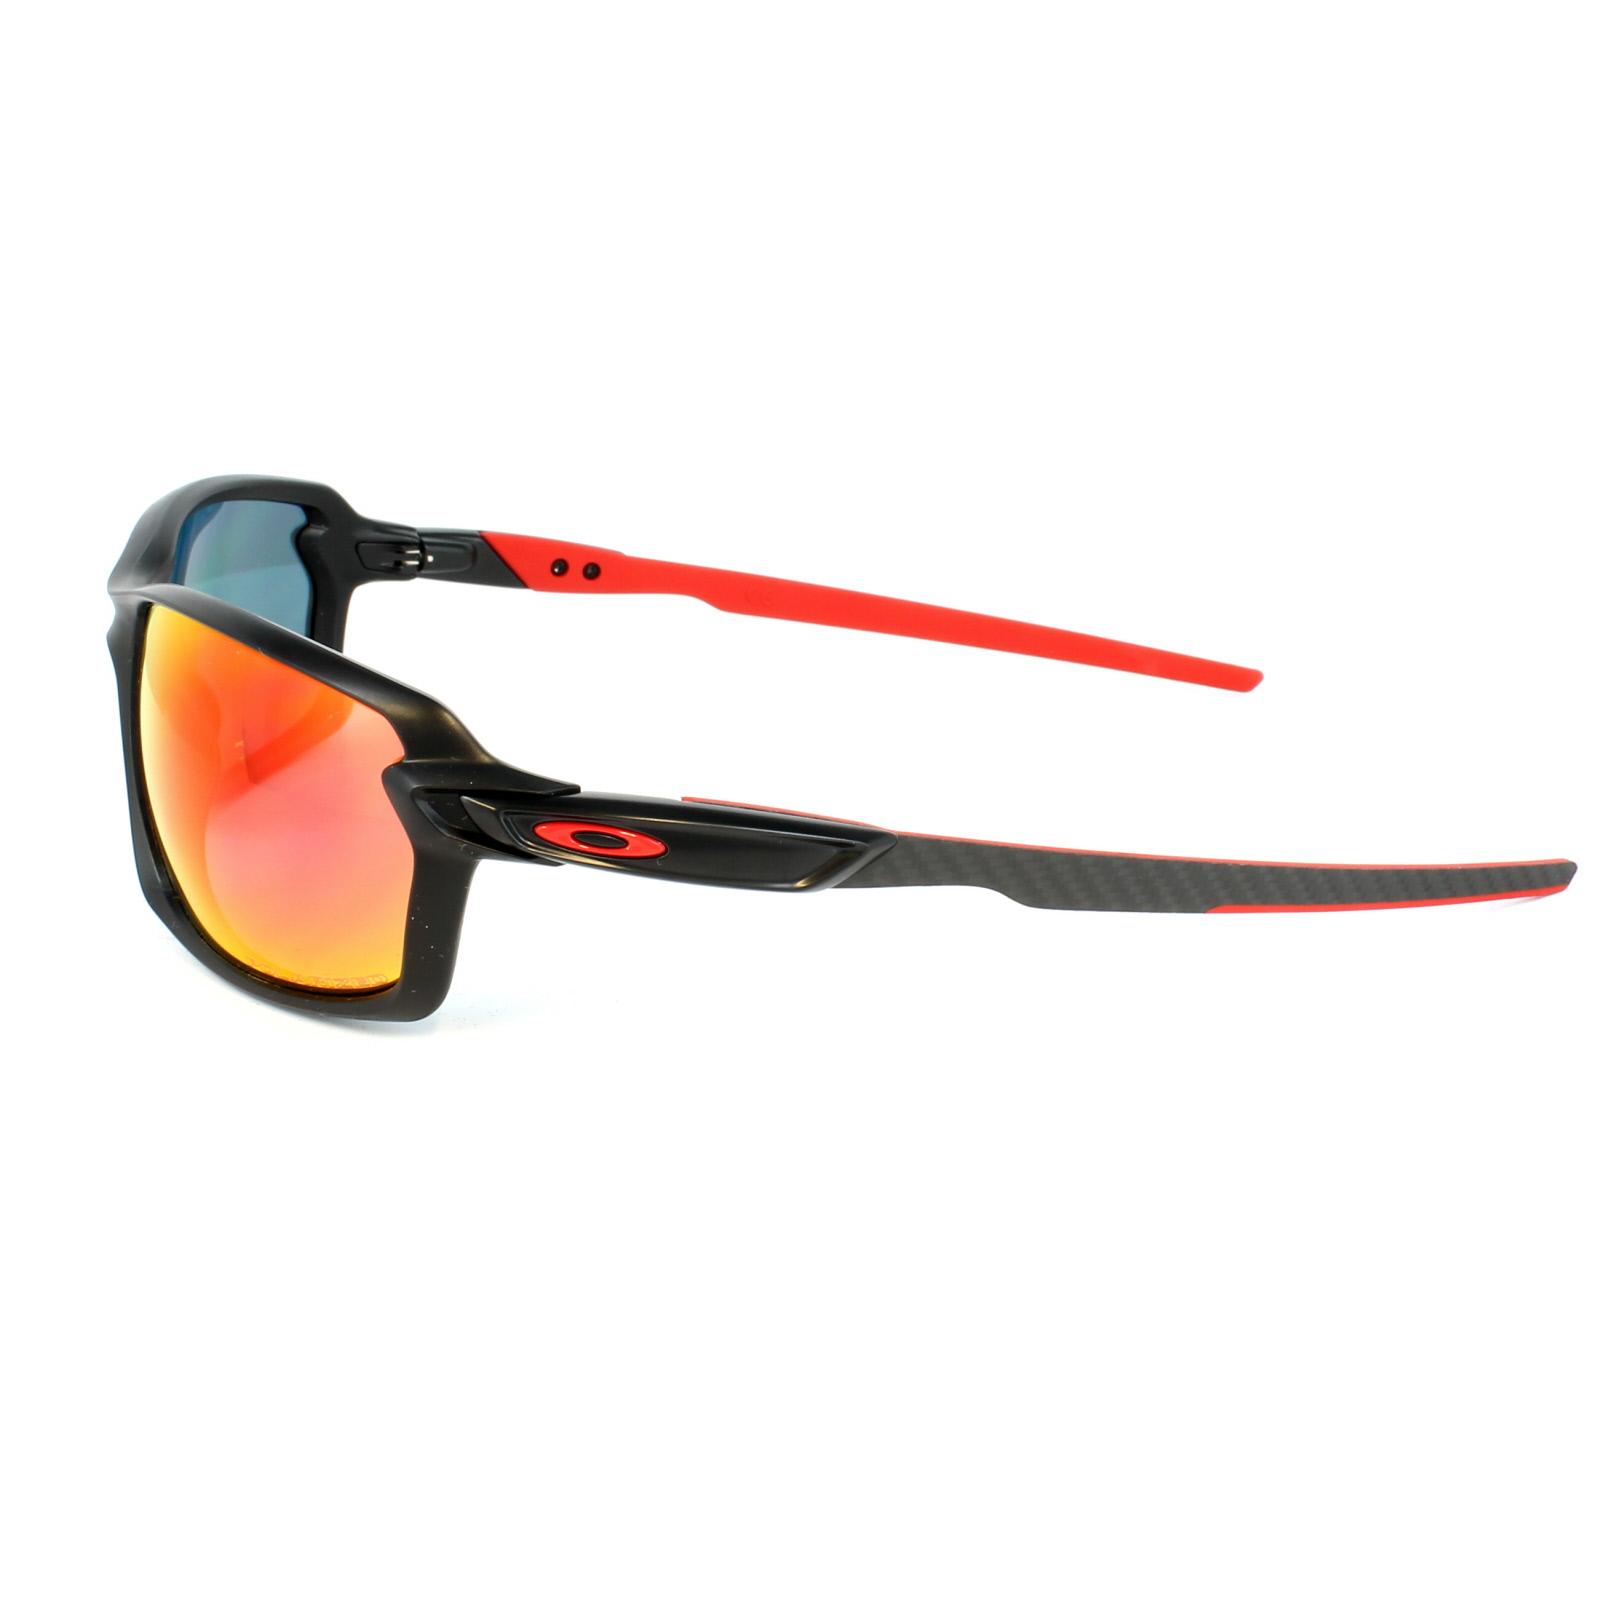 Cheap Oakley Carbon Shift Sunglasses - Discounted Sunglasses